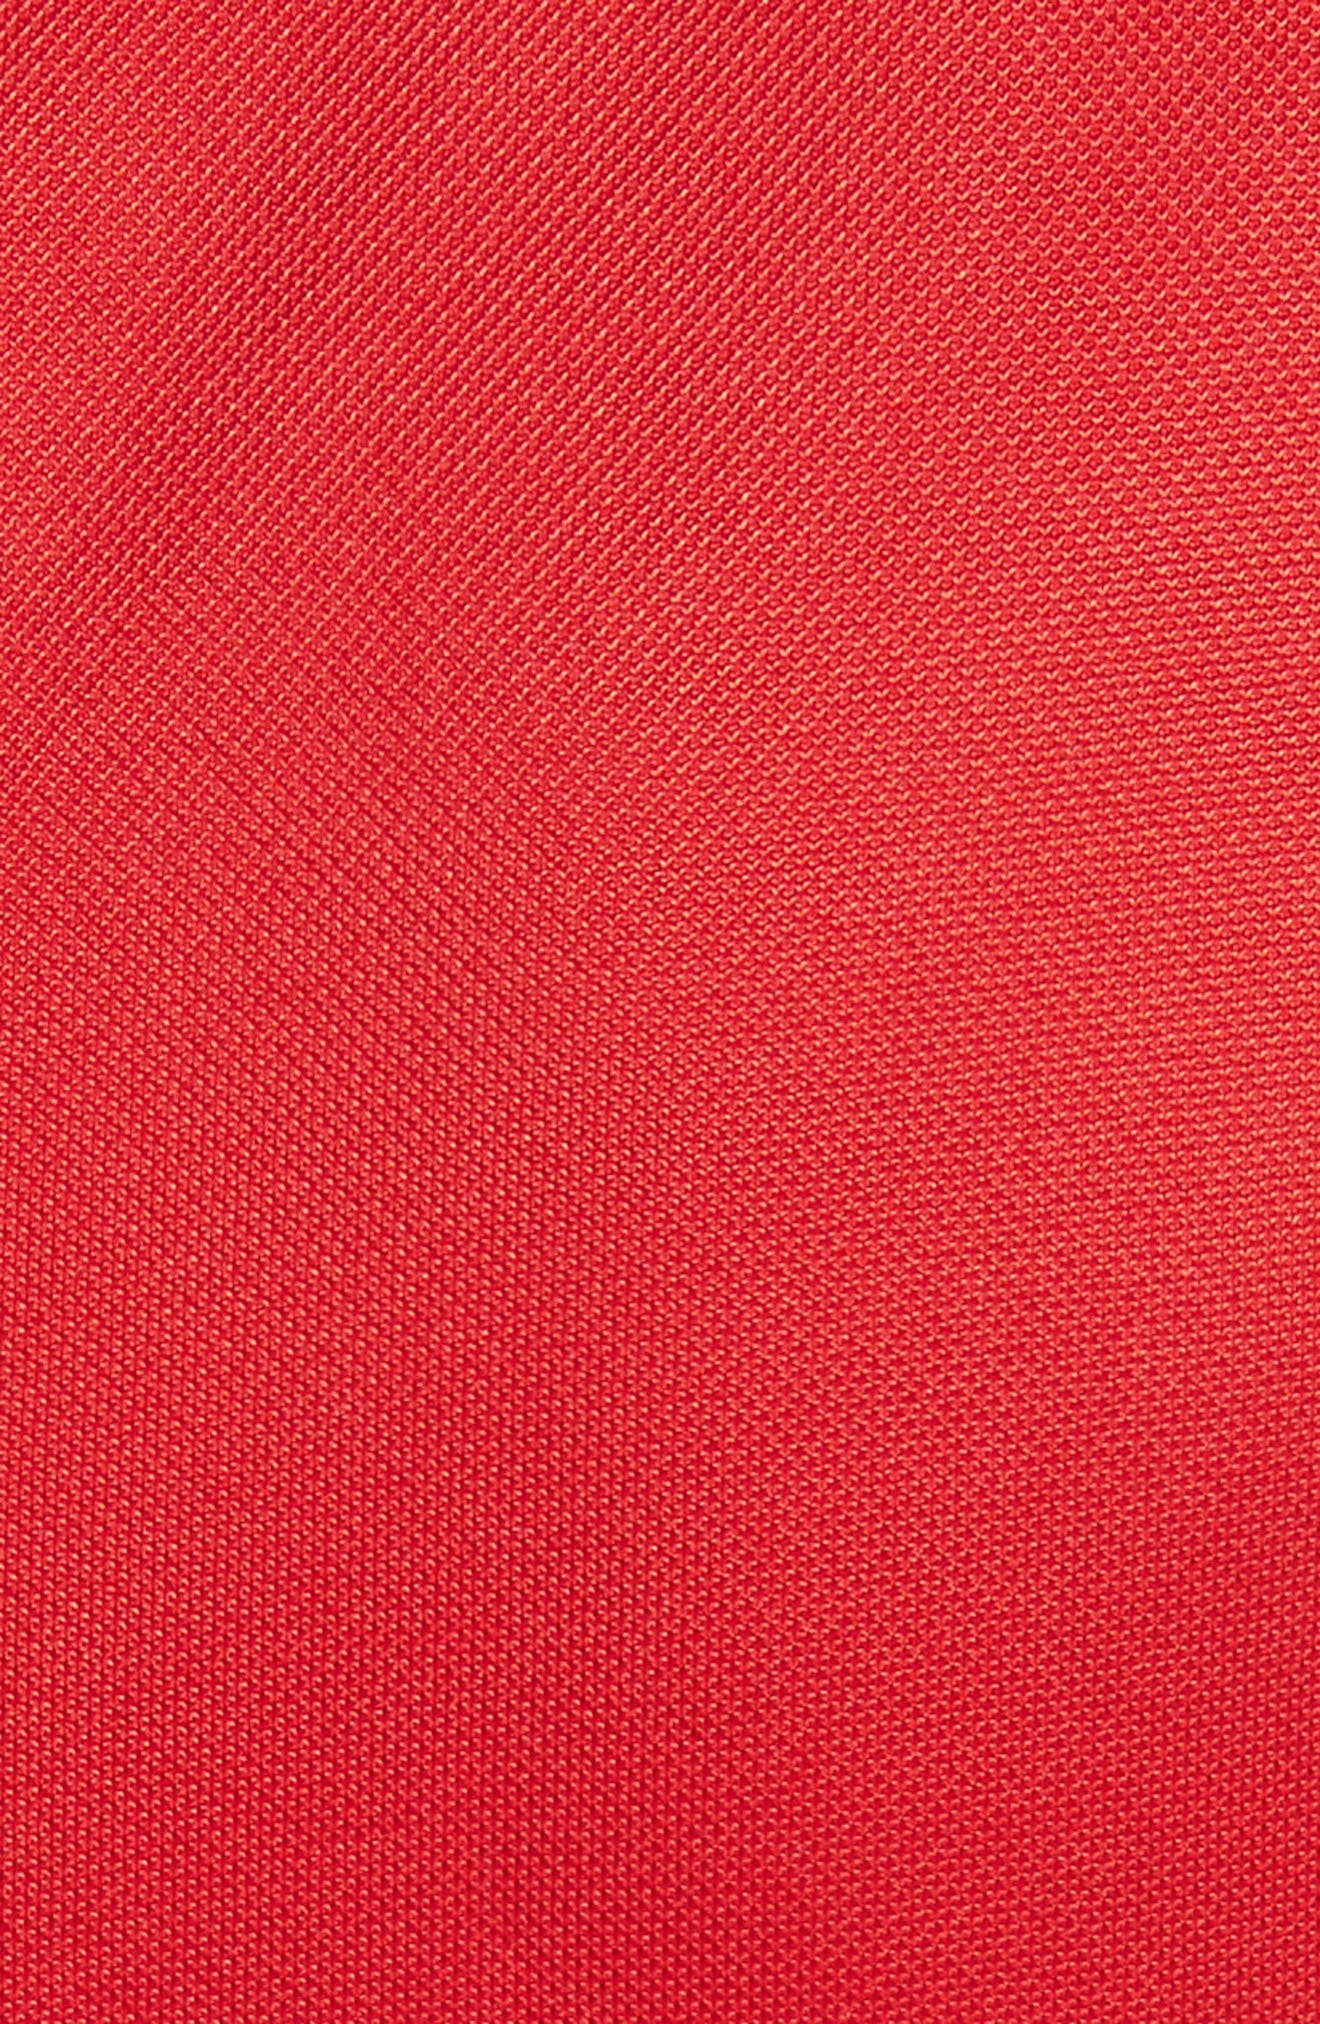 Ruched Piqué Sheath Dress,                             Alternate thumbnail 6, color,                             Red